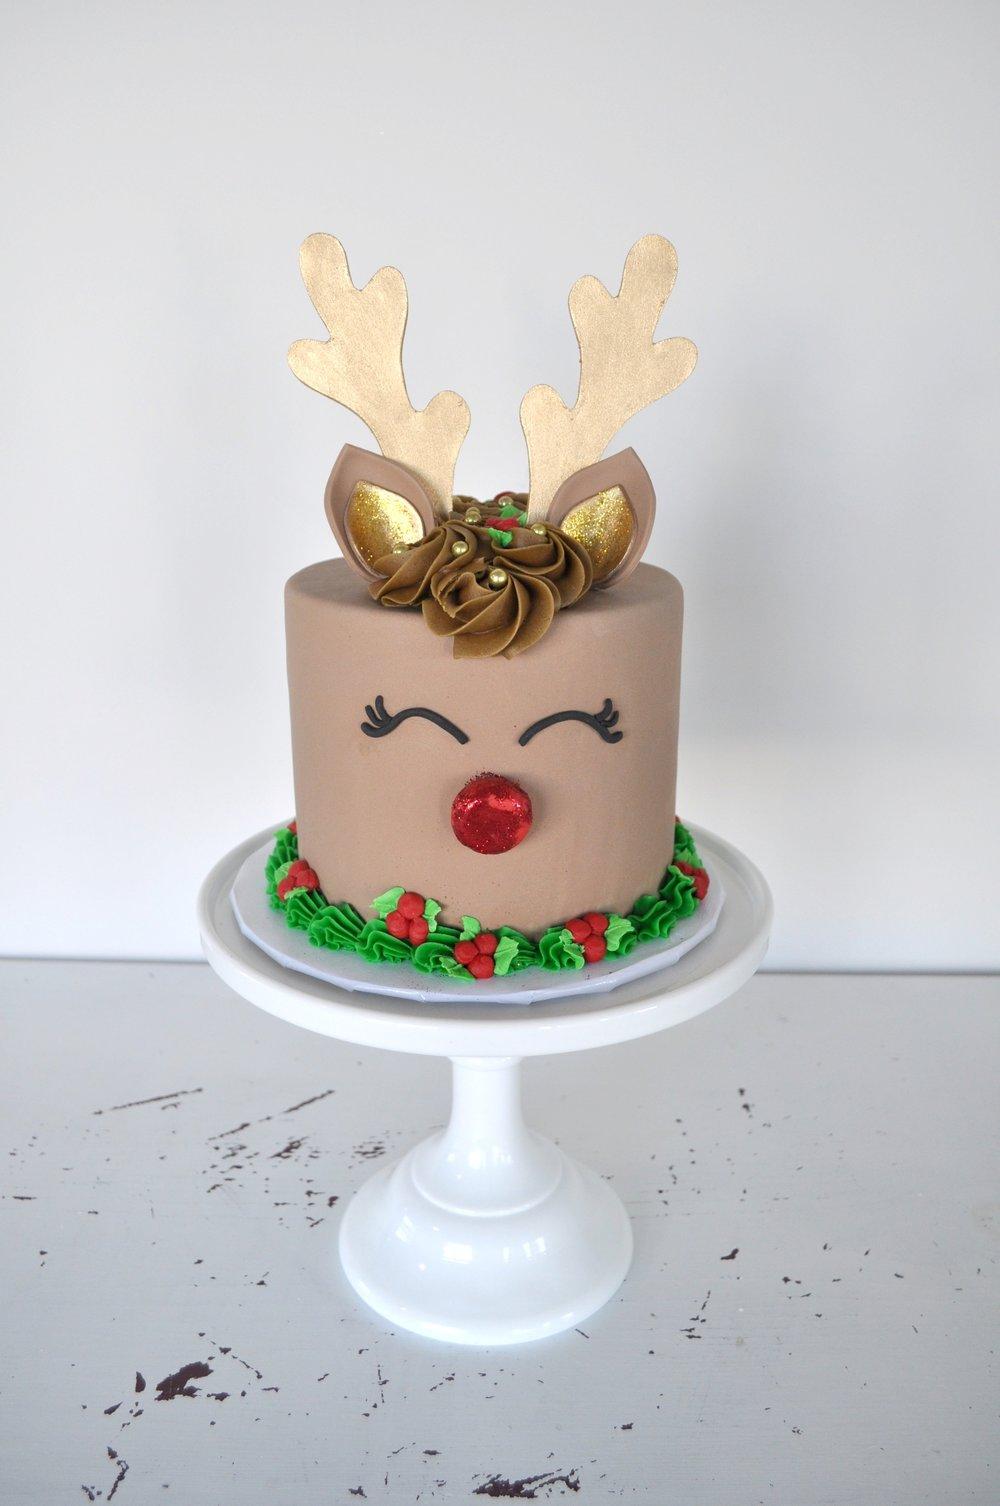 custom-cake-chritmas-rudolf-unicorn-sugarbeesweets.jpg